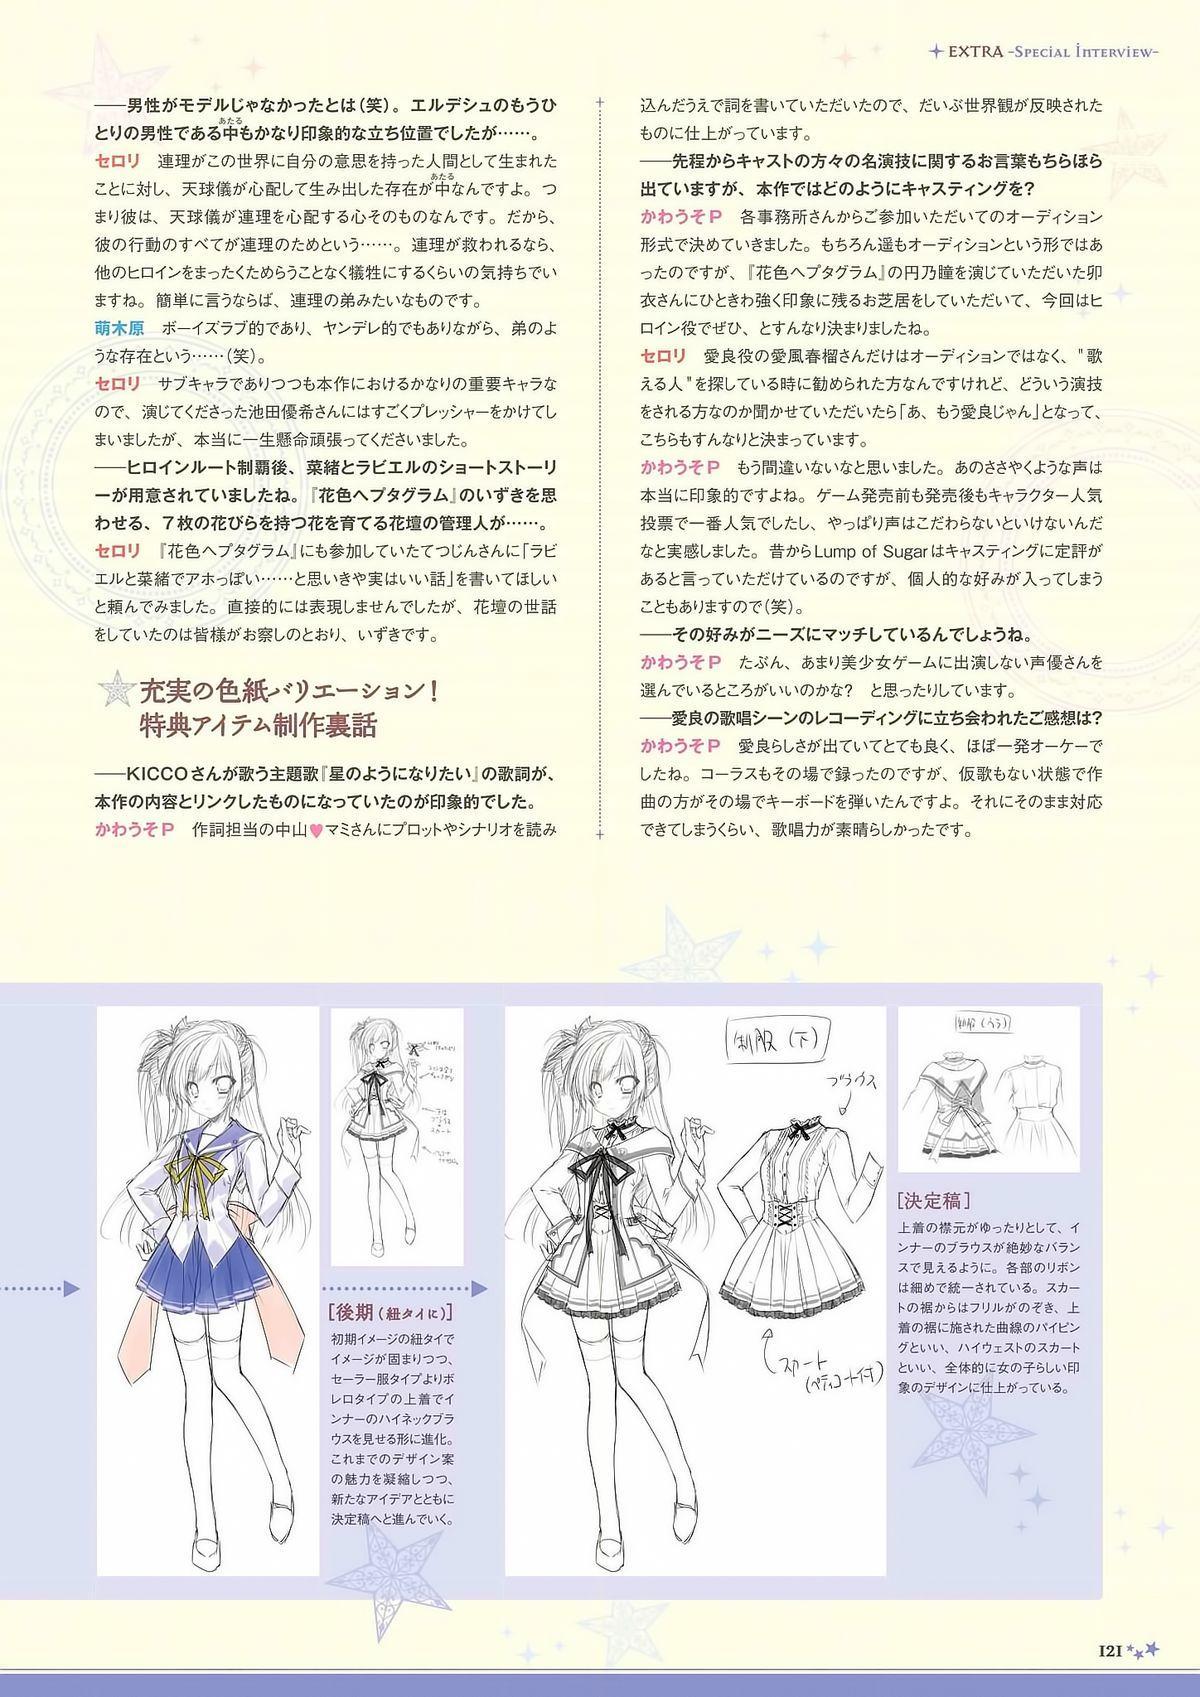 Sekai to Sekai no Mannaka de Visual Fanbook 118